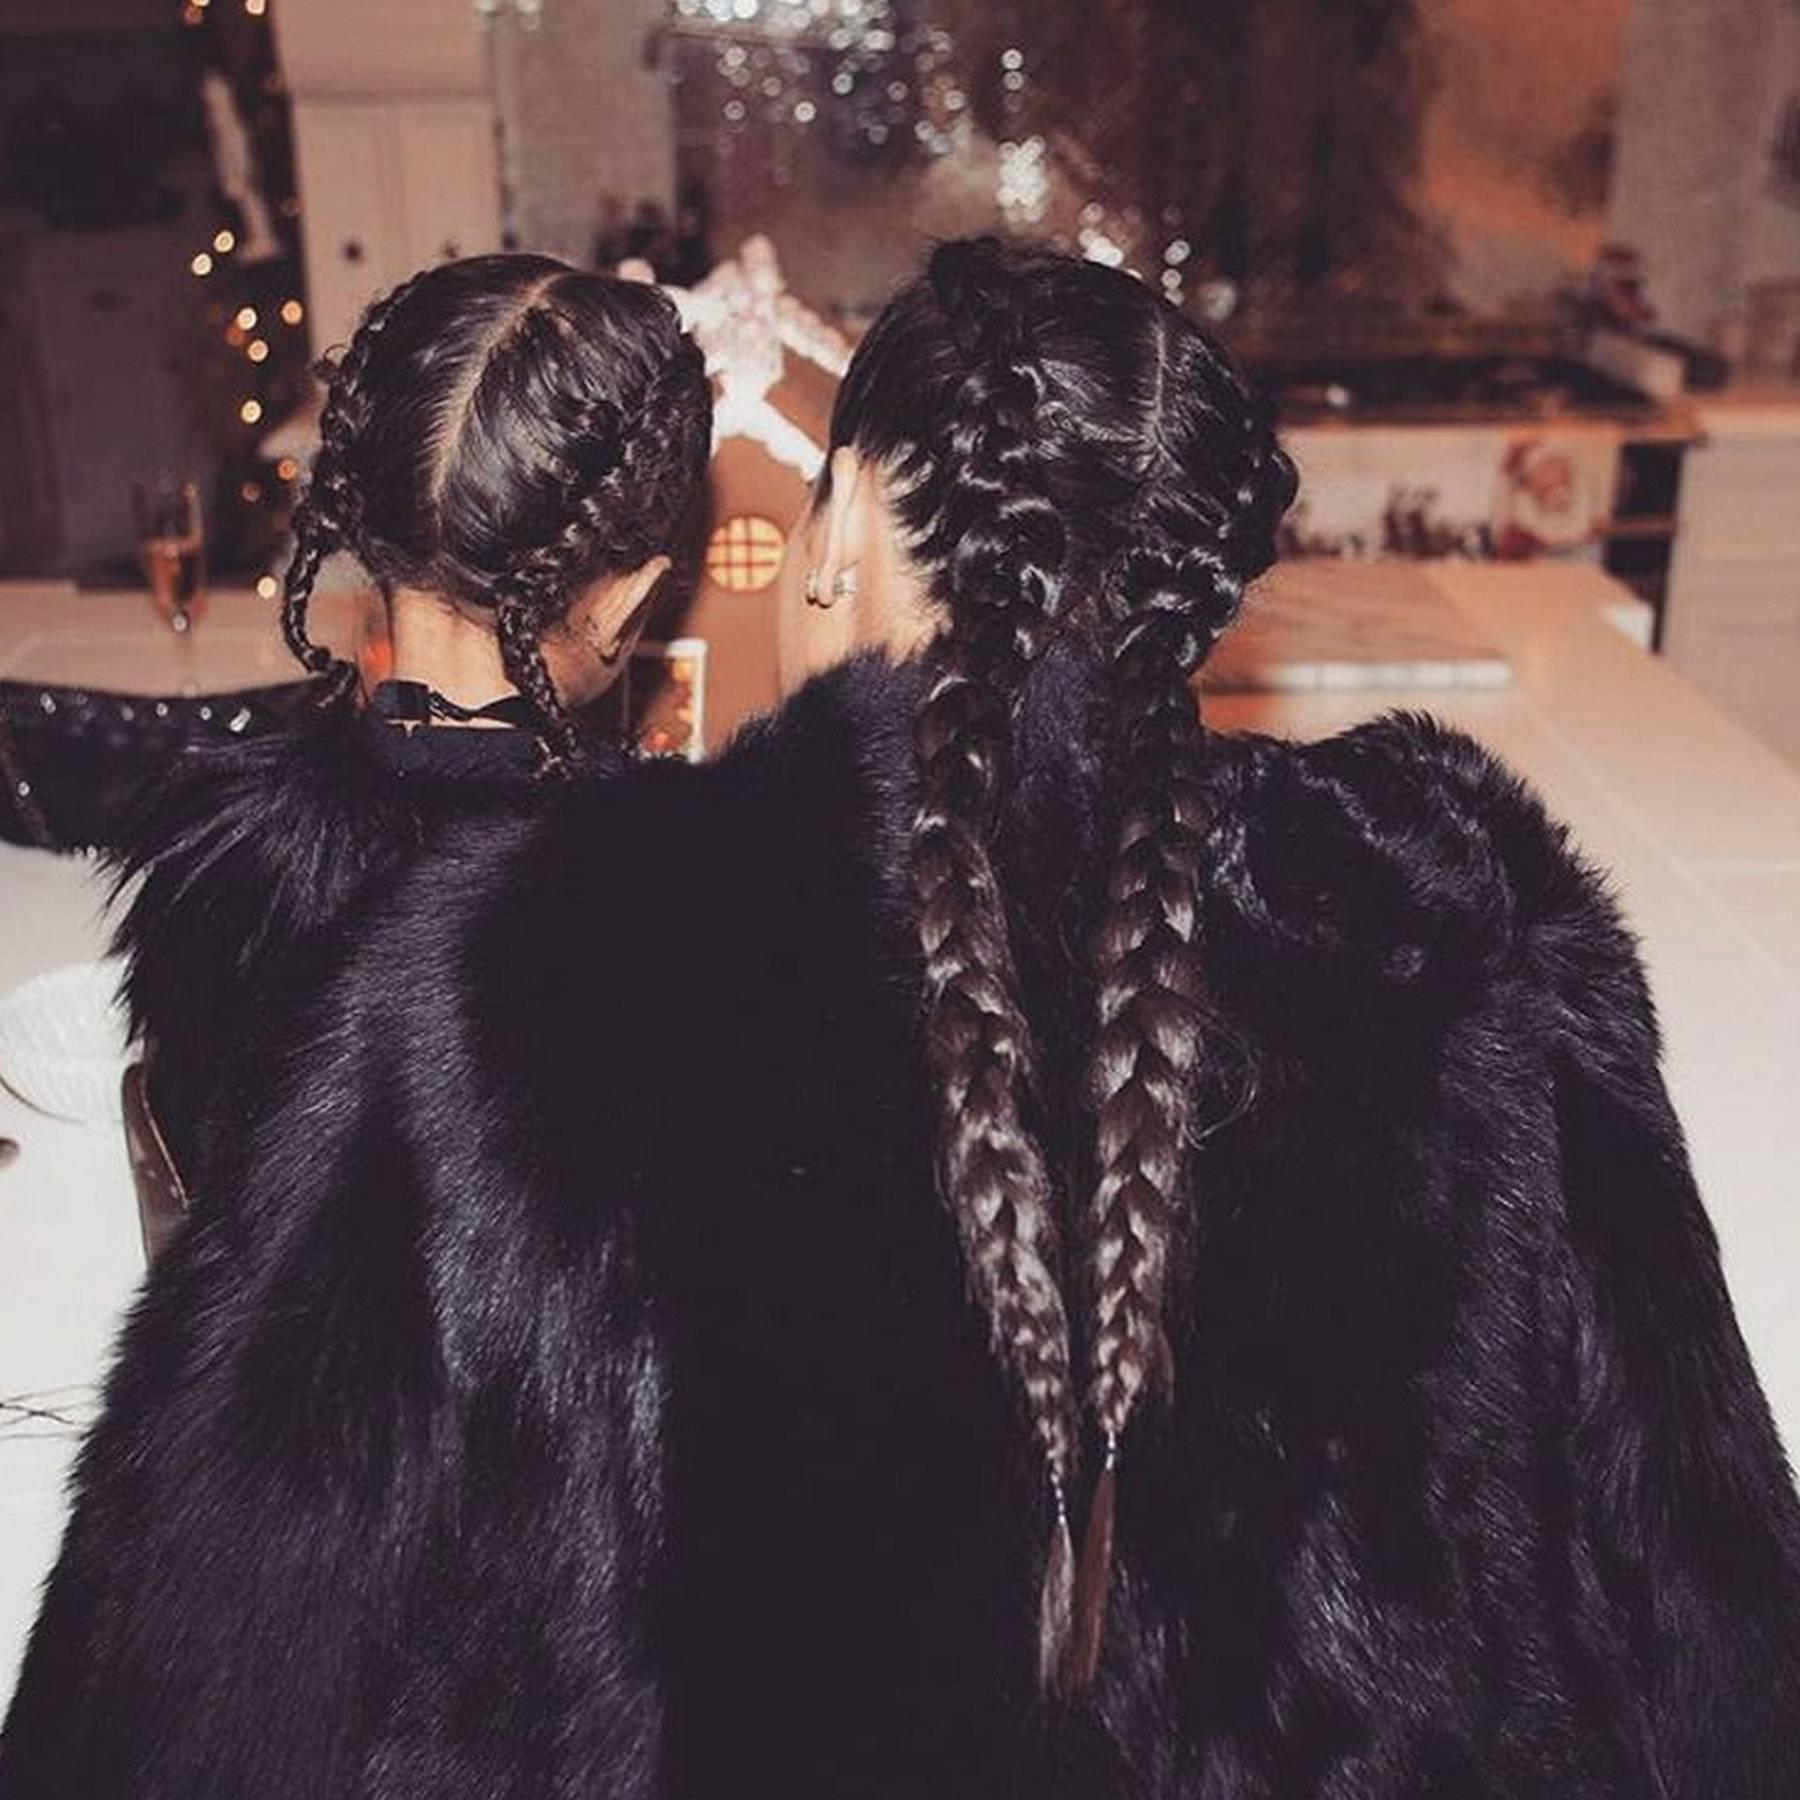 Jen Atkin Hairstylist Interview Kylie Jenner Hair Tips Glamour Uk